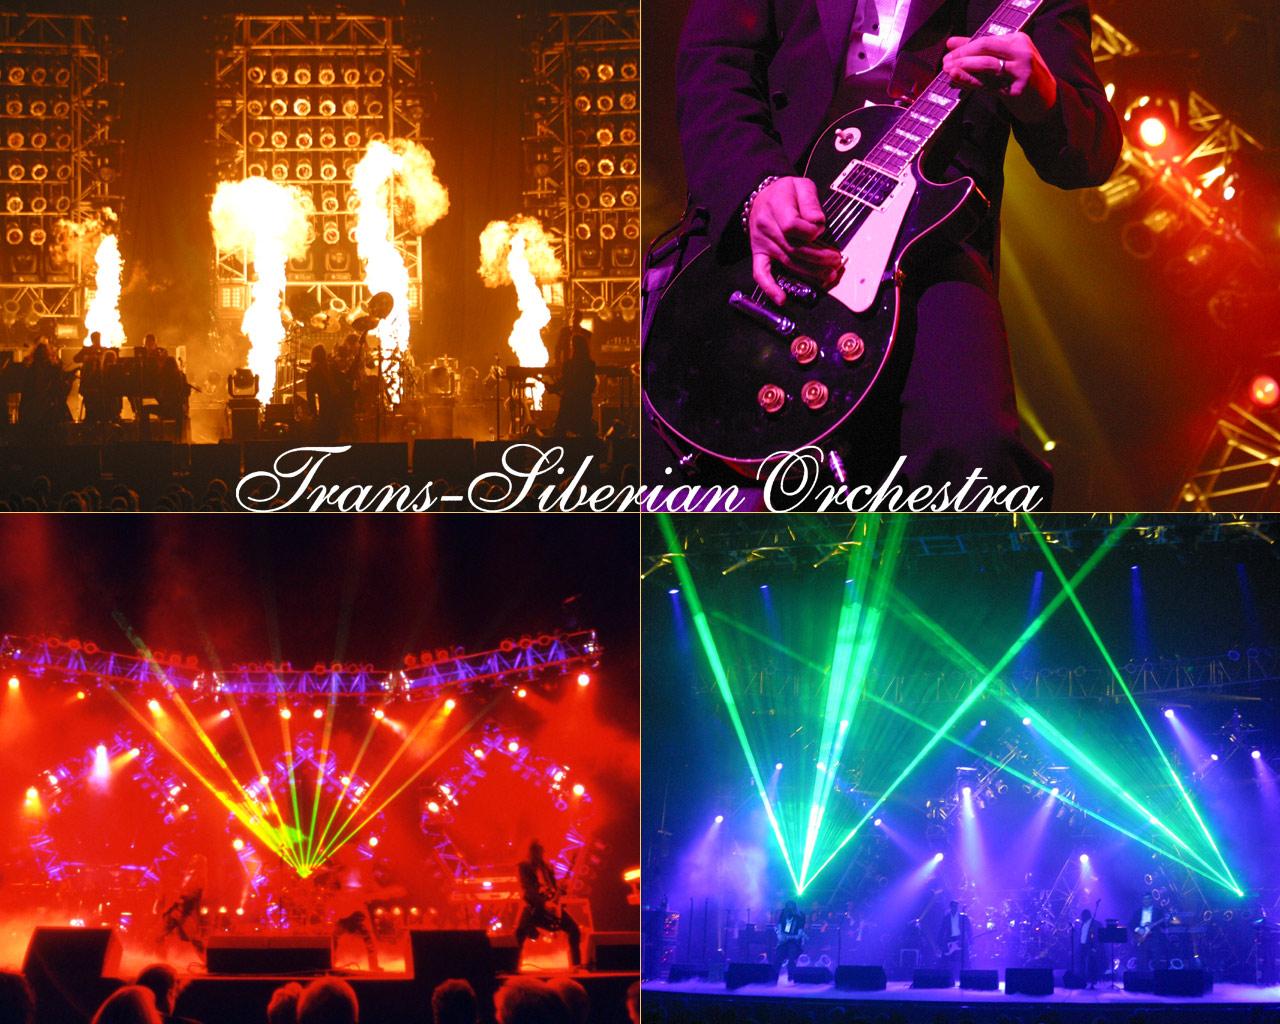 Trans siberian orchestra tour dates 2014